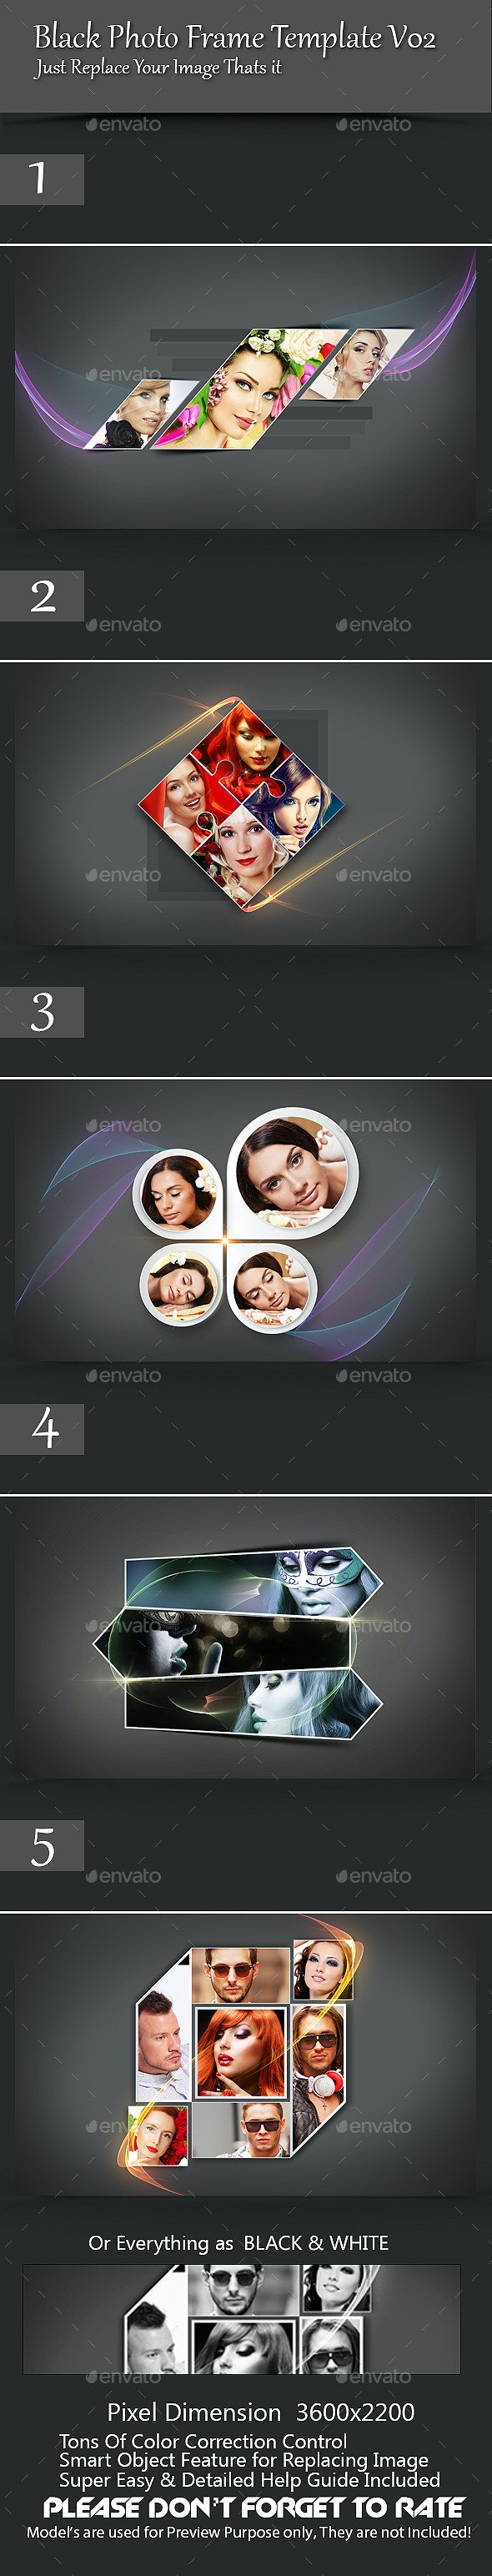 Black Photo Frame Template V02 - Photo Templates Graphics